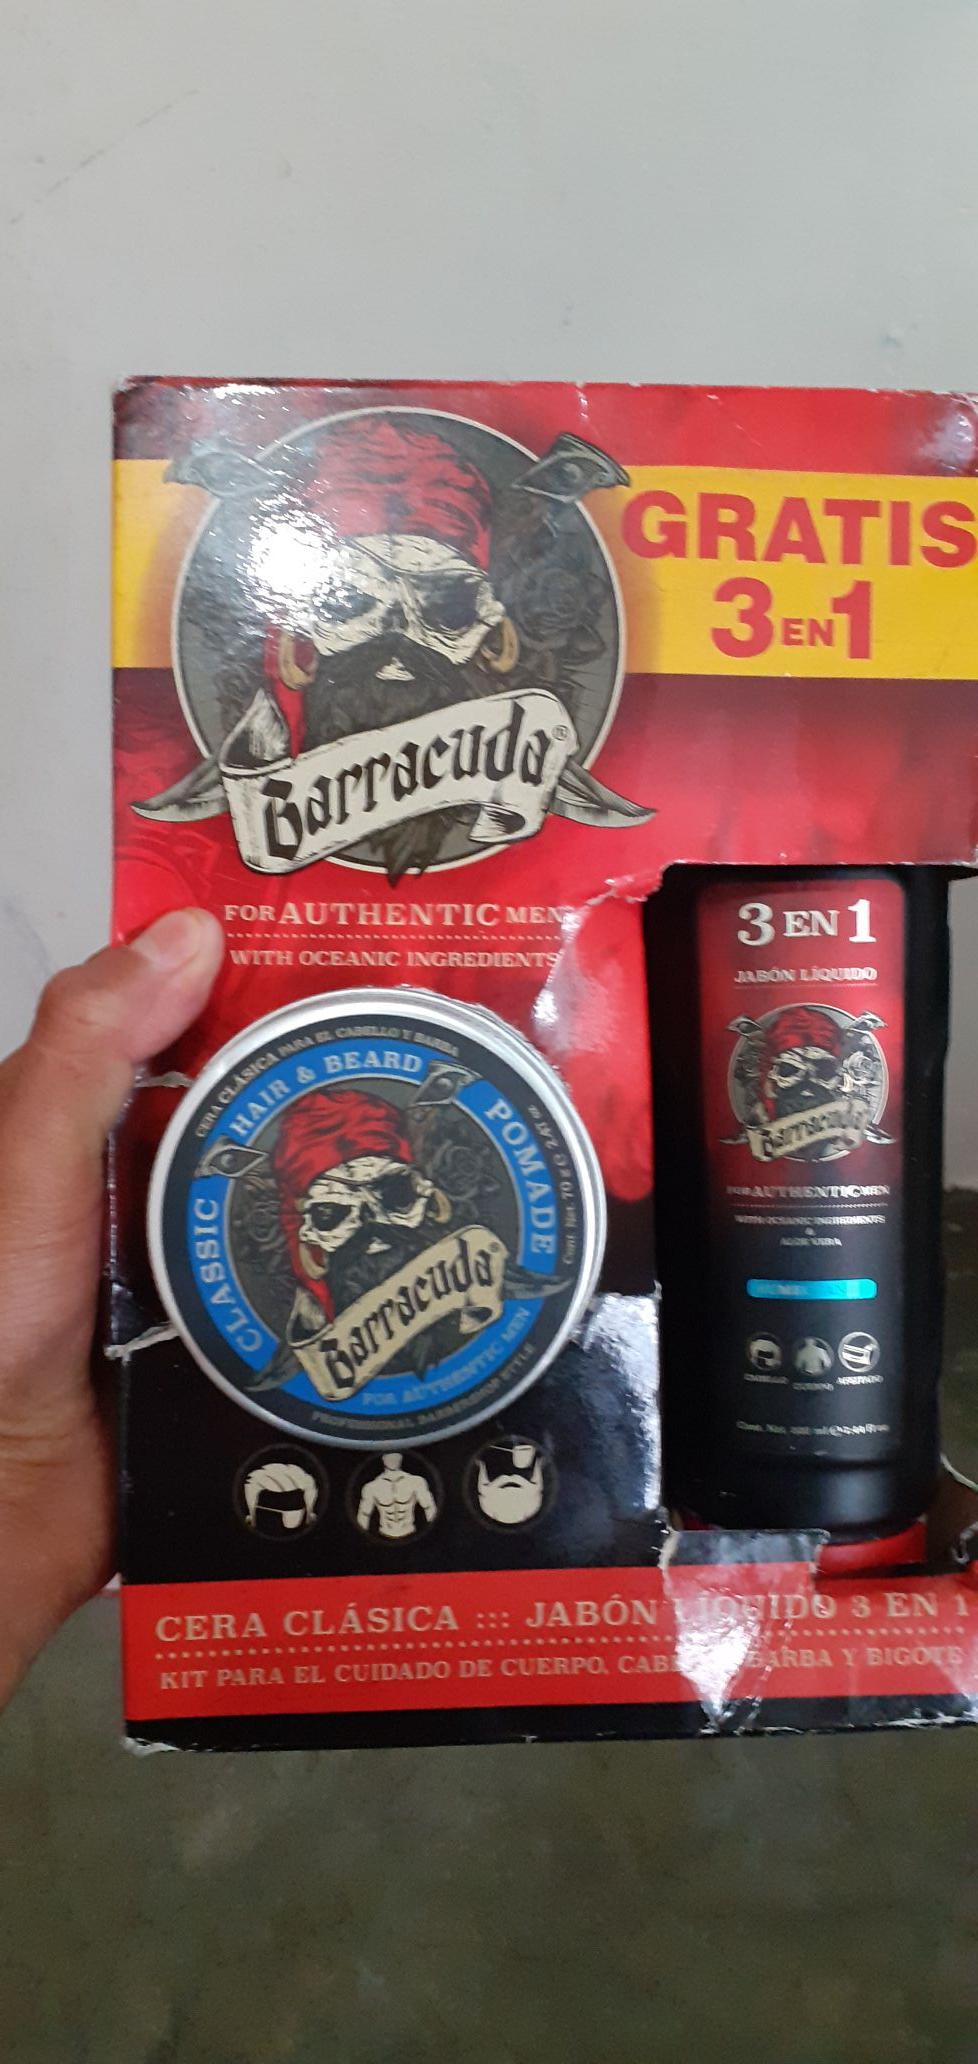 Bodega Aurrera: Jabon liquido Barracuda 3 en 1